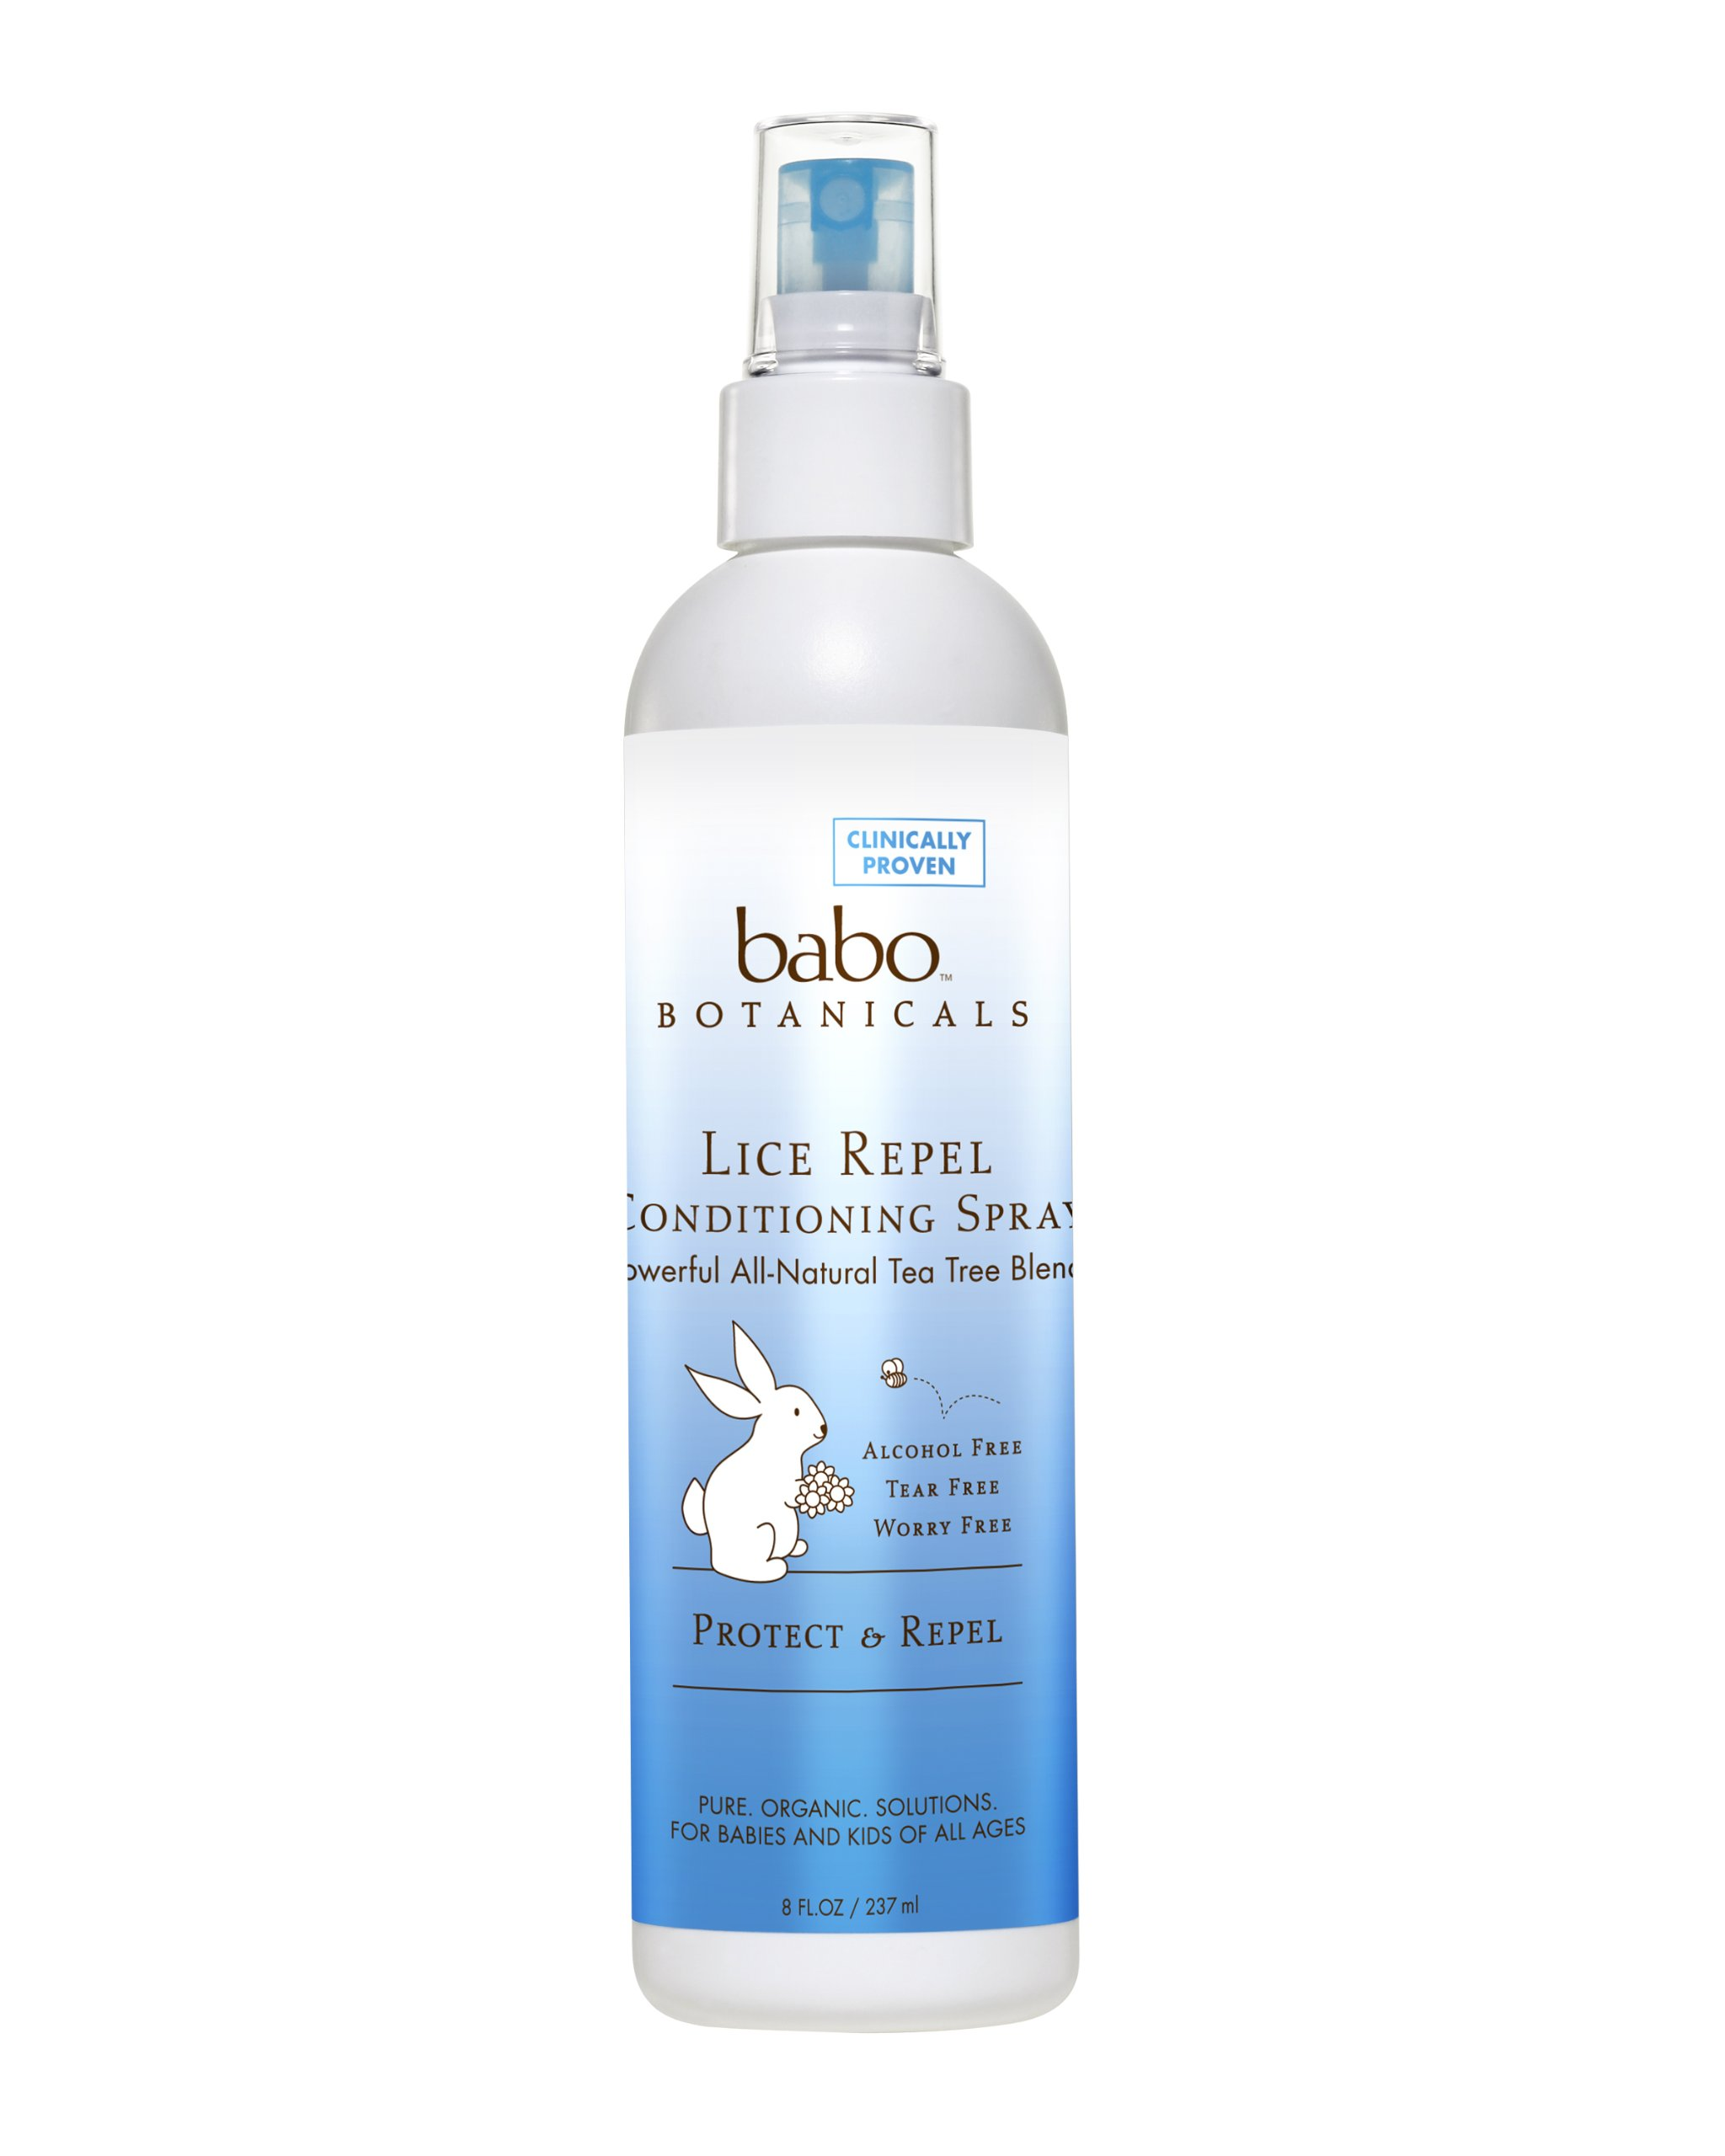 Babo Botanicals Lice Repel Conditioning Spray Rosemary - 8 Fl Oz